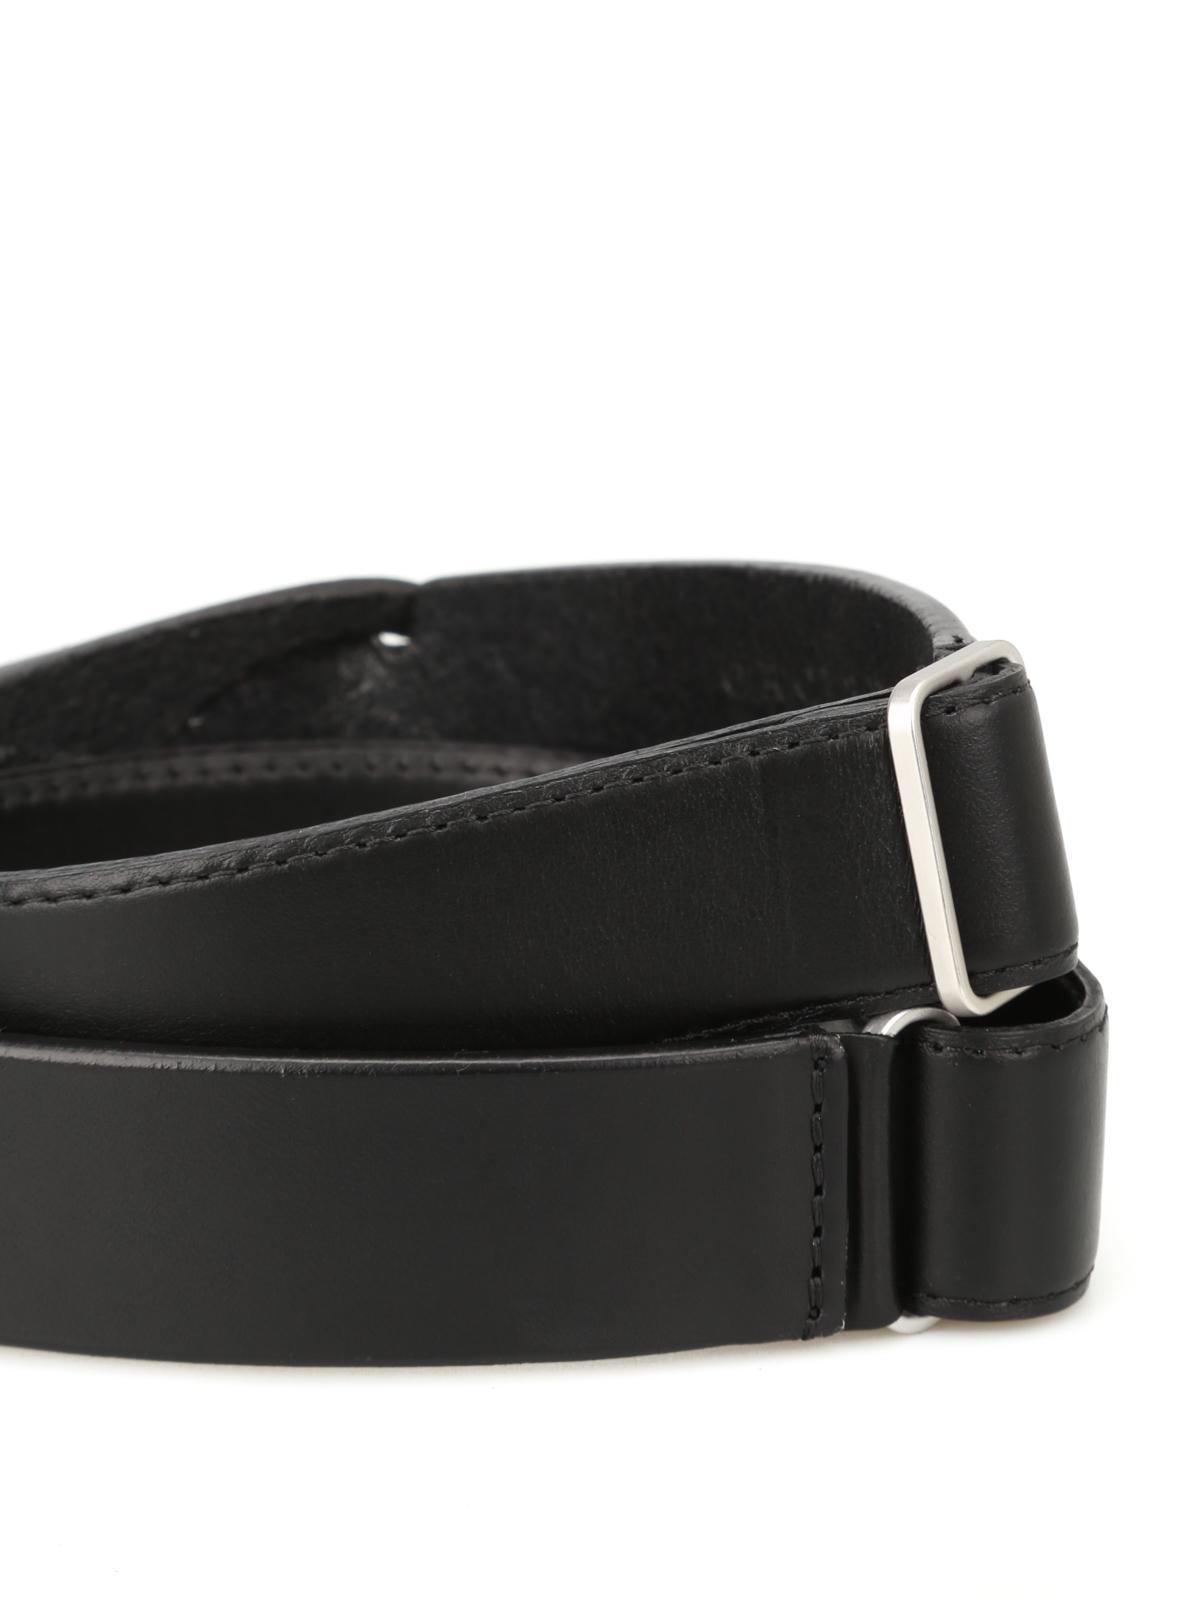 nuovo di zecca 515ec 8114a Orciani - Cintura in cuoio Bull senza fibbia - cinture ...